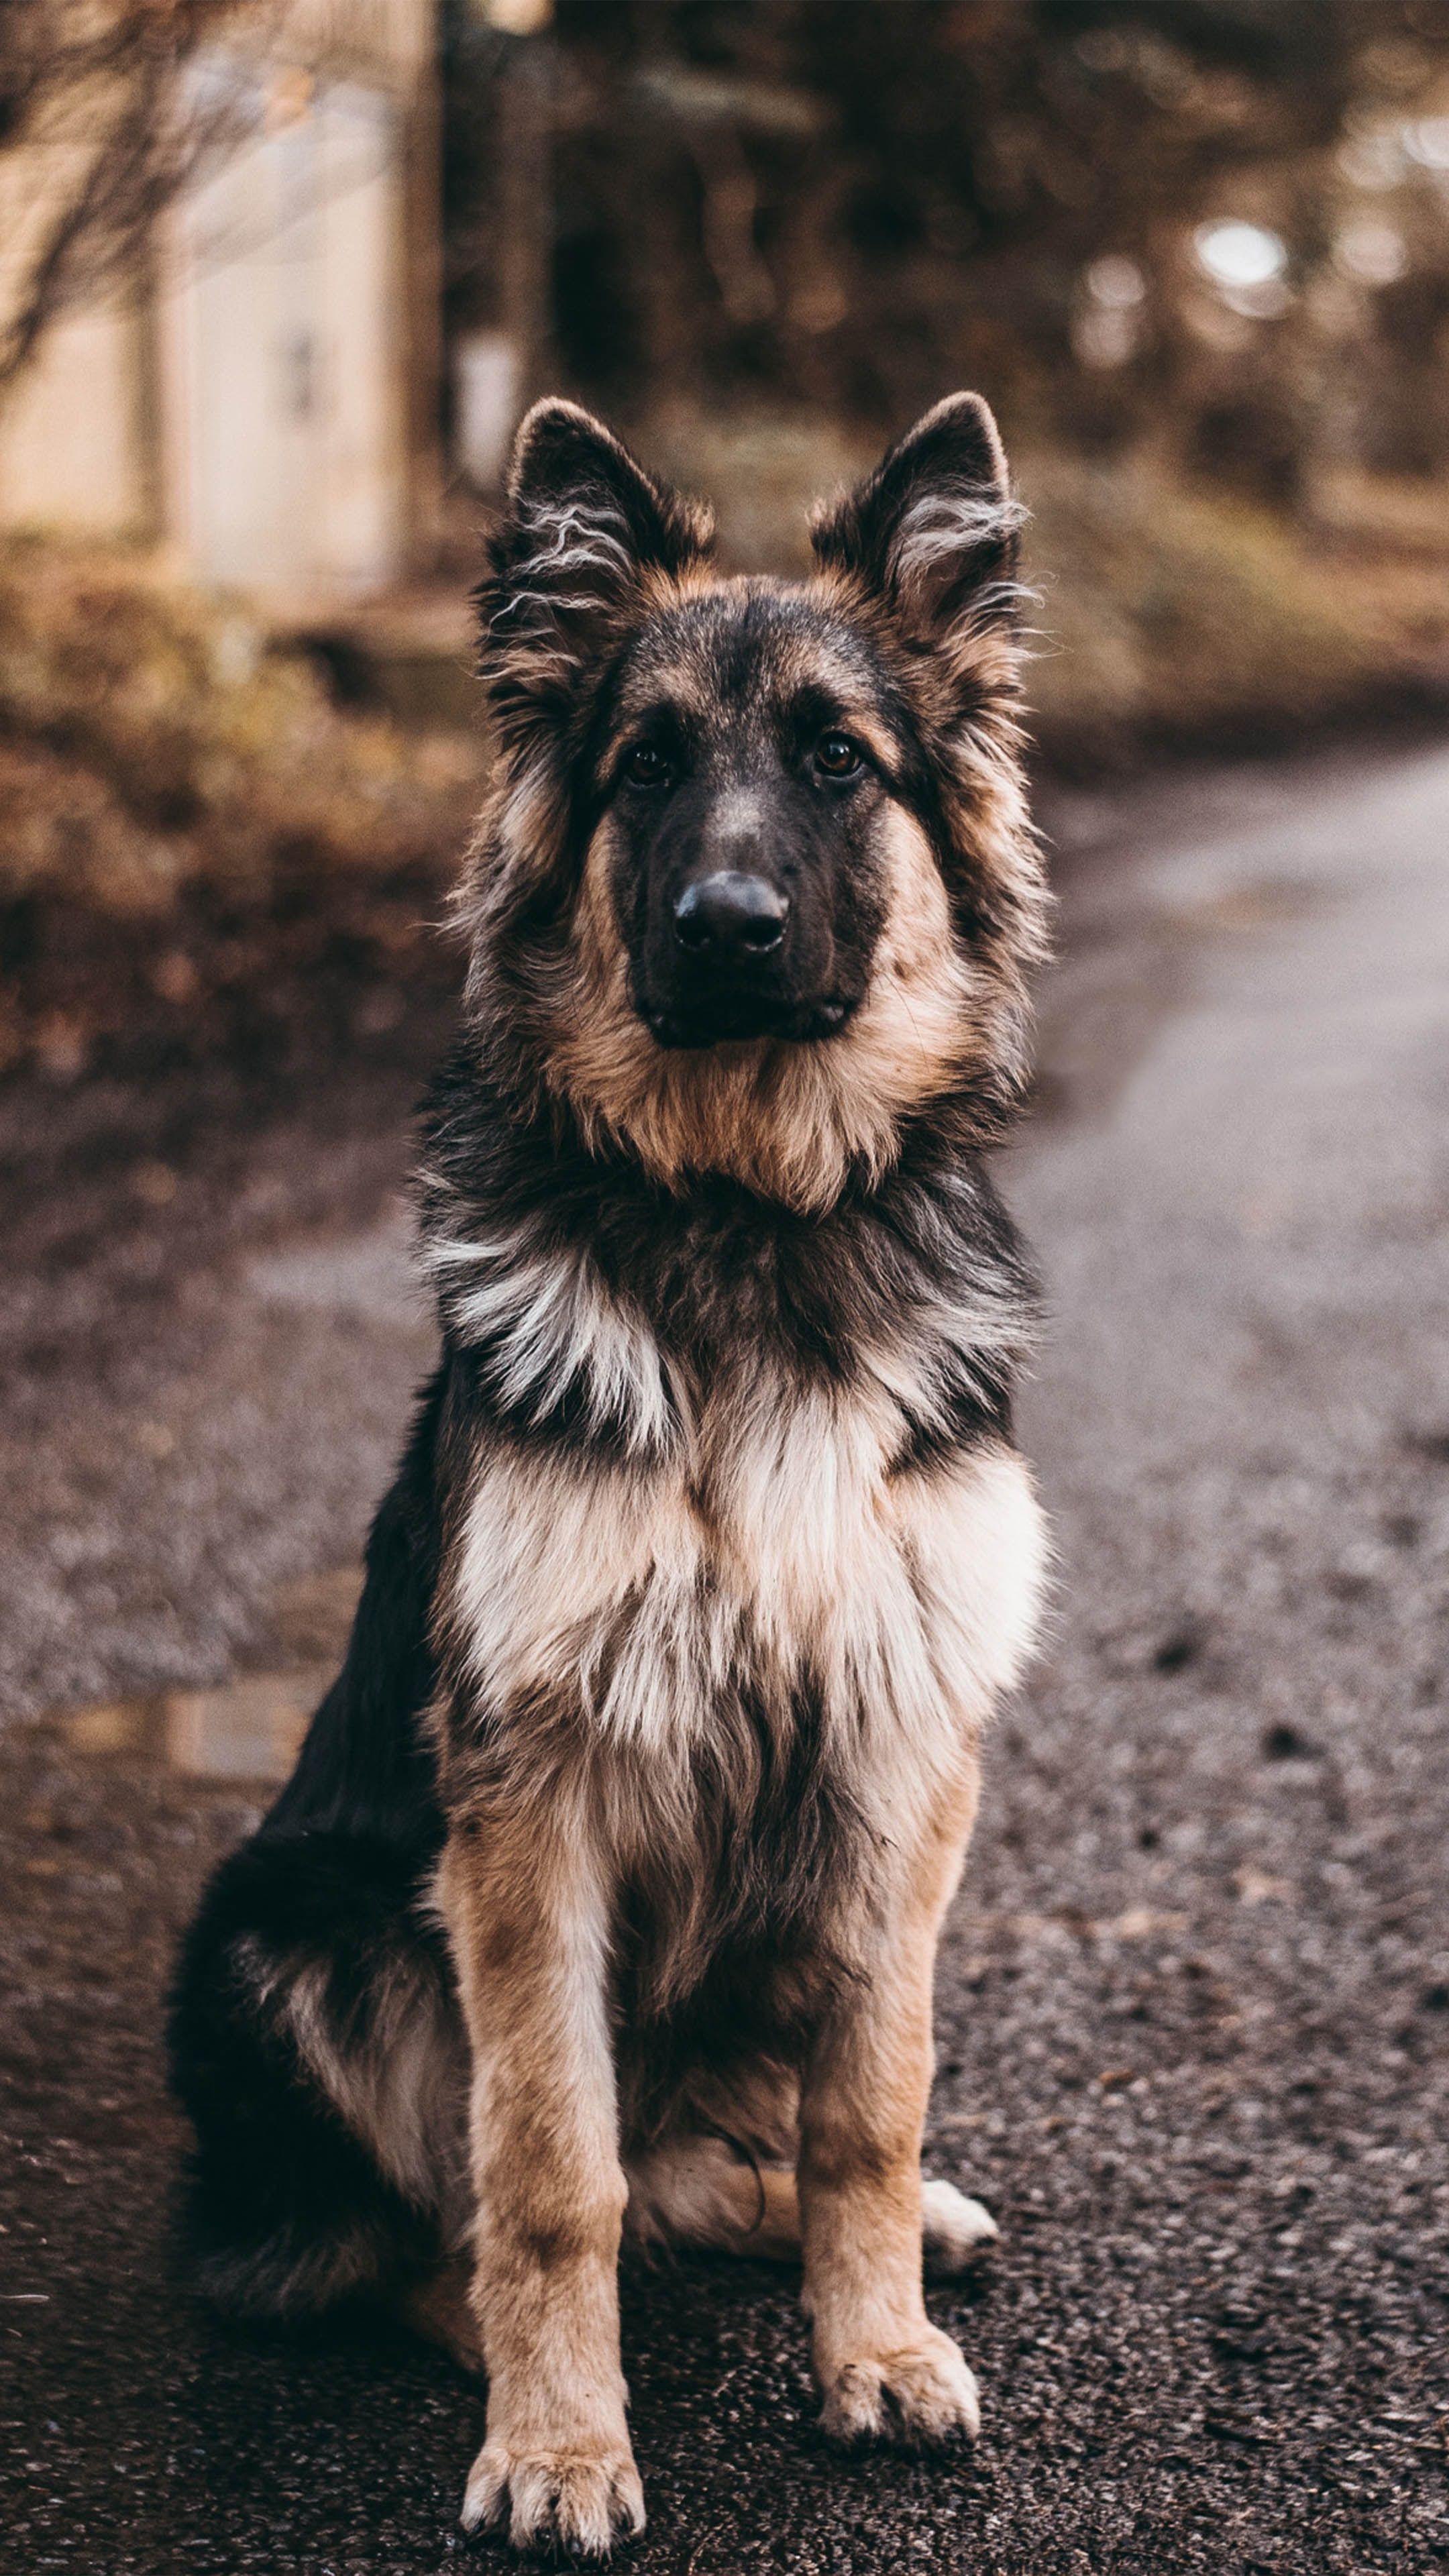 German Shepherd Dog Sits 4k Ultra Hd Mobile Wallpaper In 2020 Dog Background German Shepherd Wallpaper Dogs